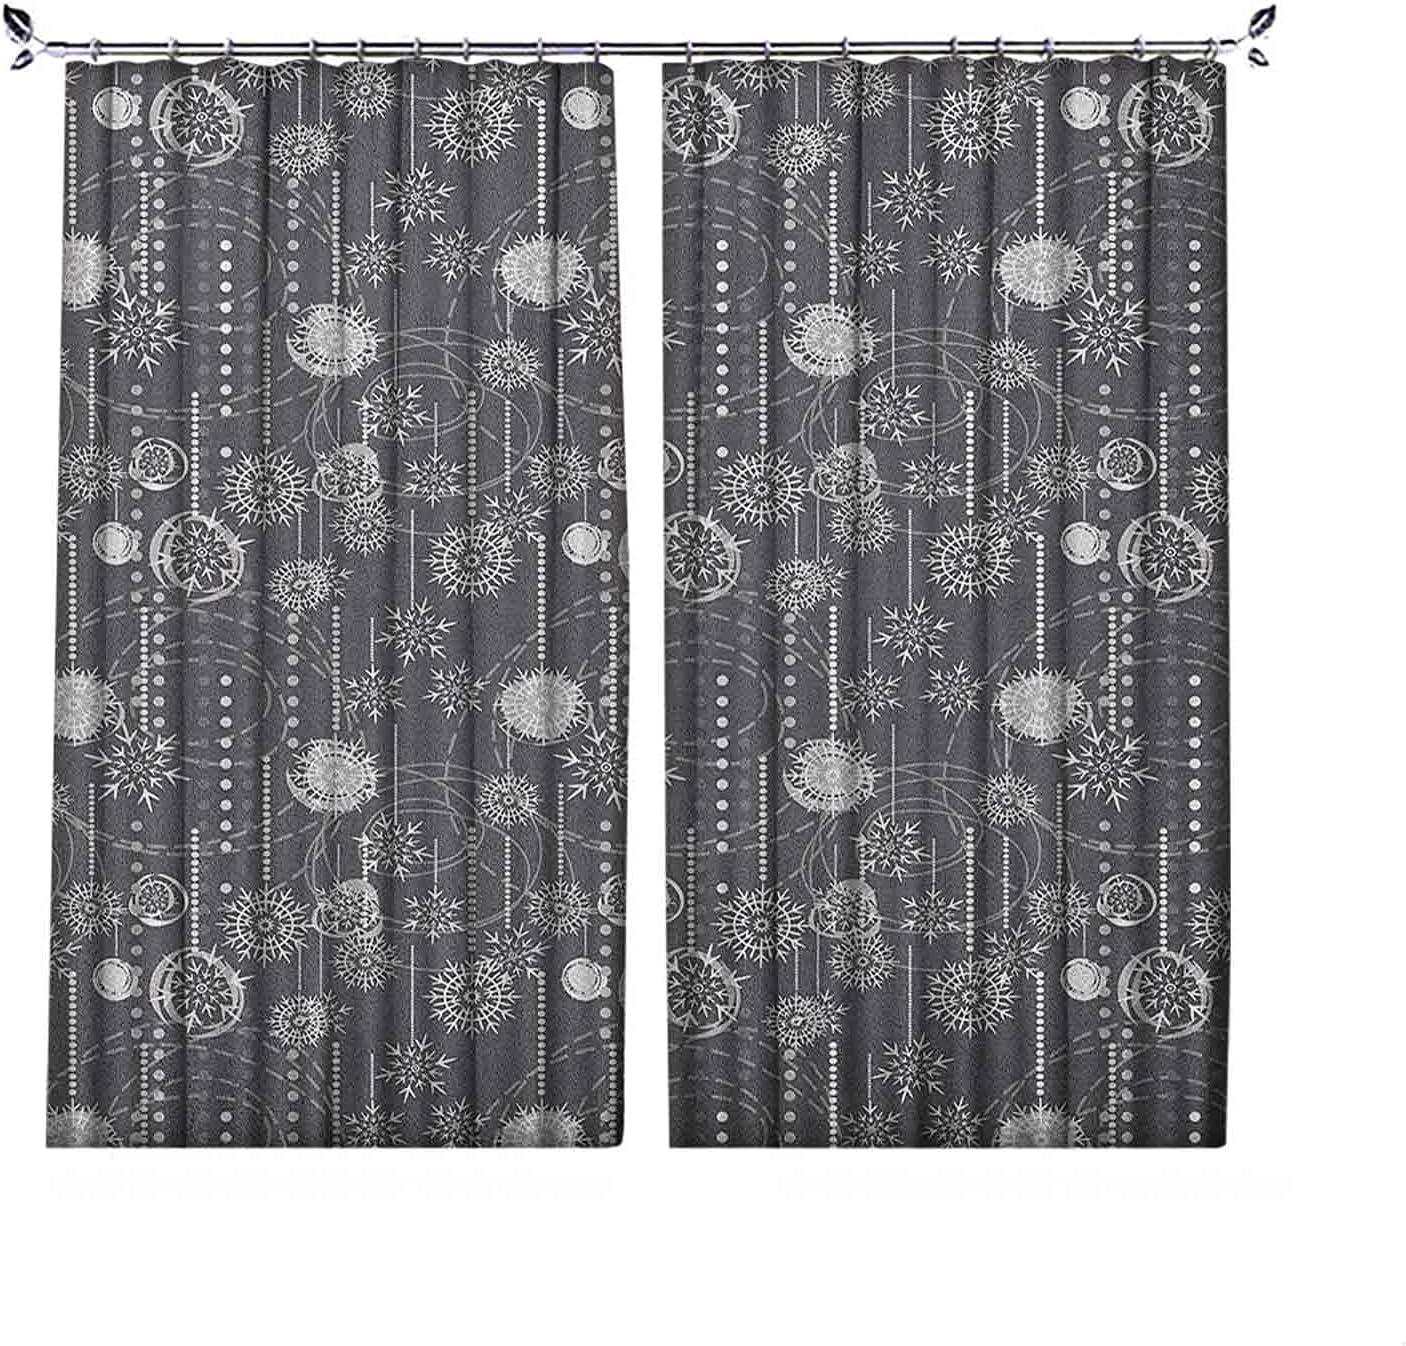 Pinch Pleat Textured Reservation List price Winter wit Monochrome Composition Curtains